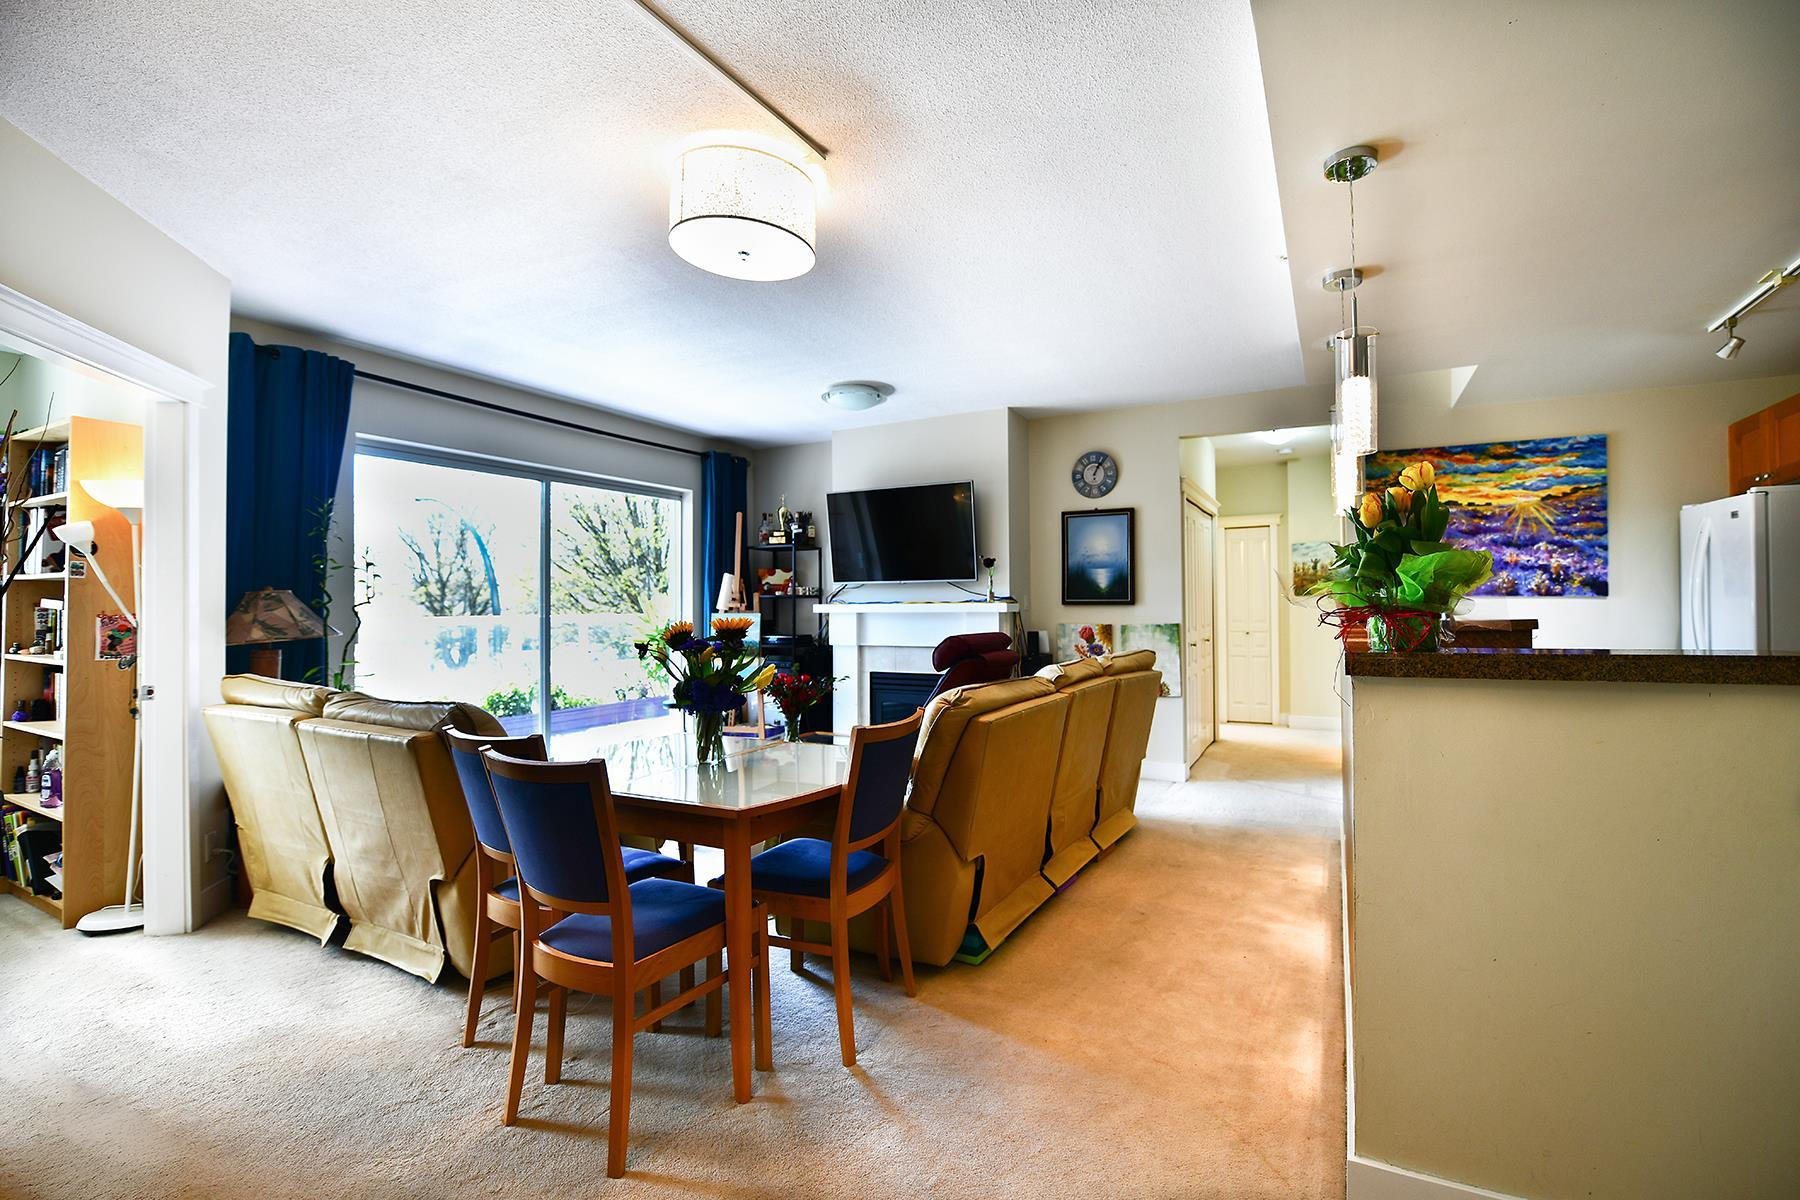 204 5790 EAST BOULEVARD - Kerrisdale Apartment/Condo for sale, 3 Bedrooms (R2604138) - #4